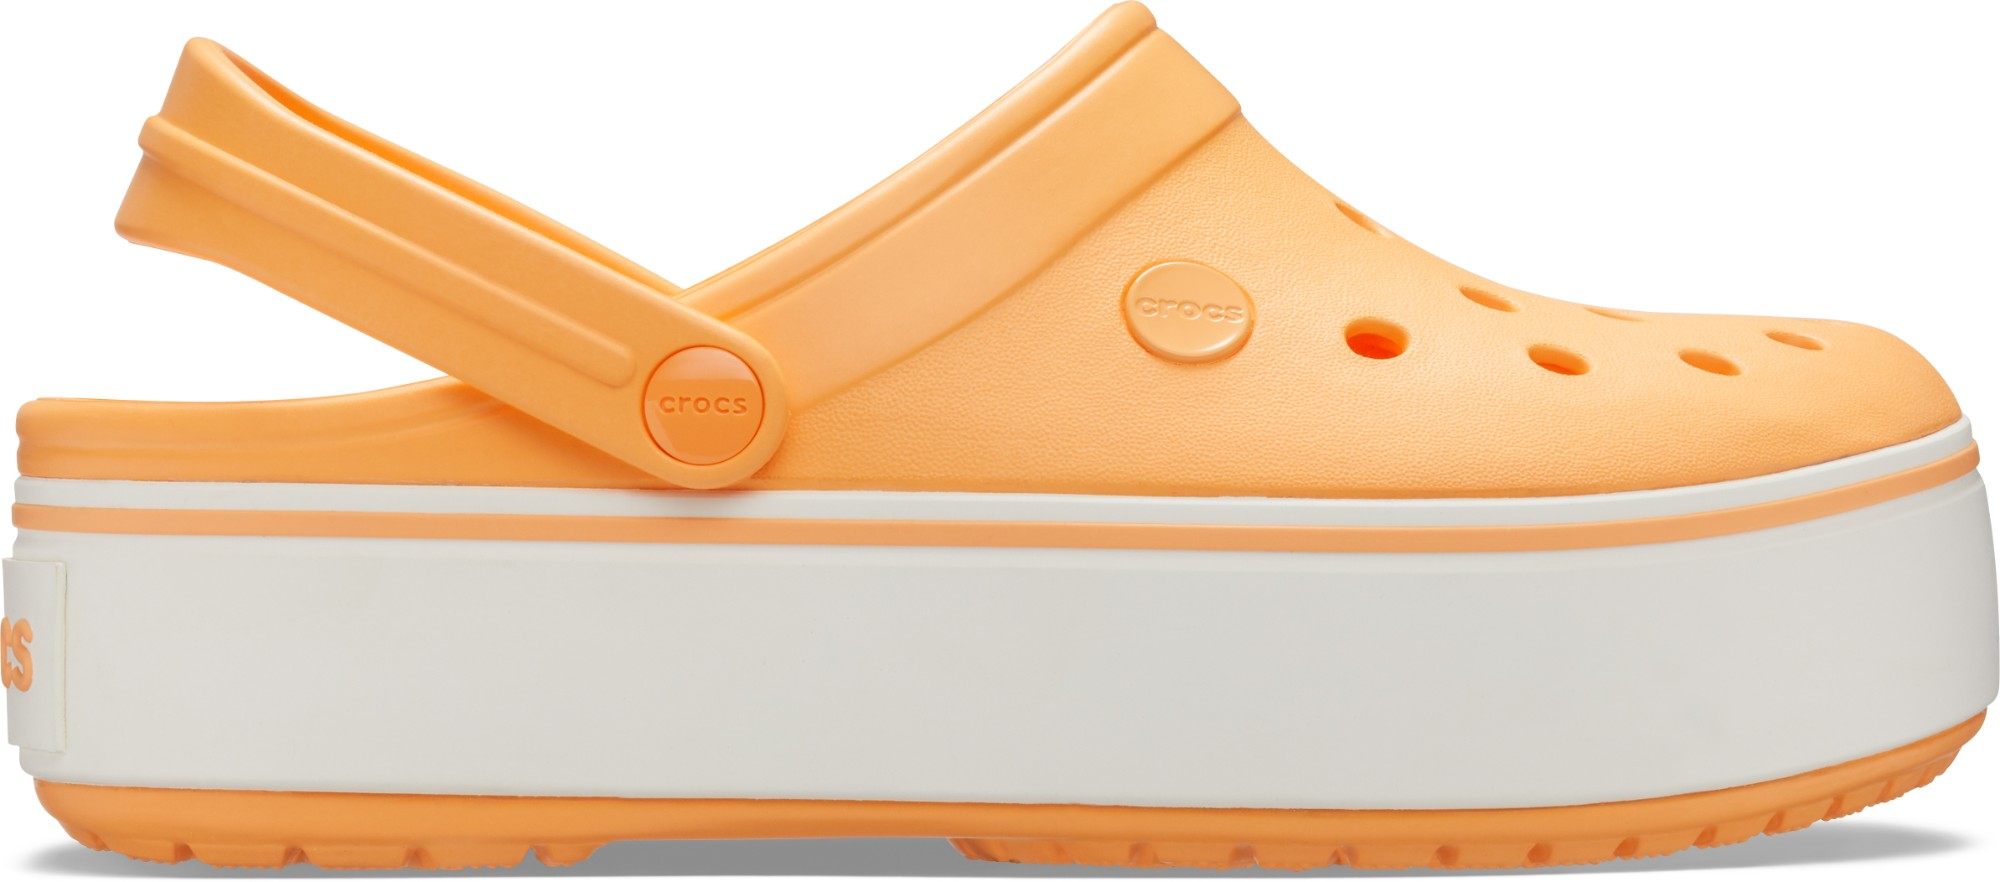 Crocs™ Crocband Platform Clog Cantaloupe/White 38,5